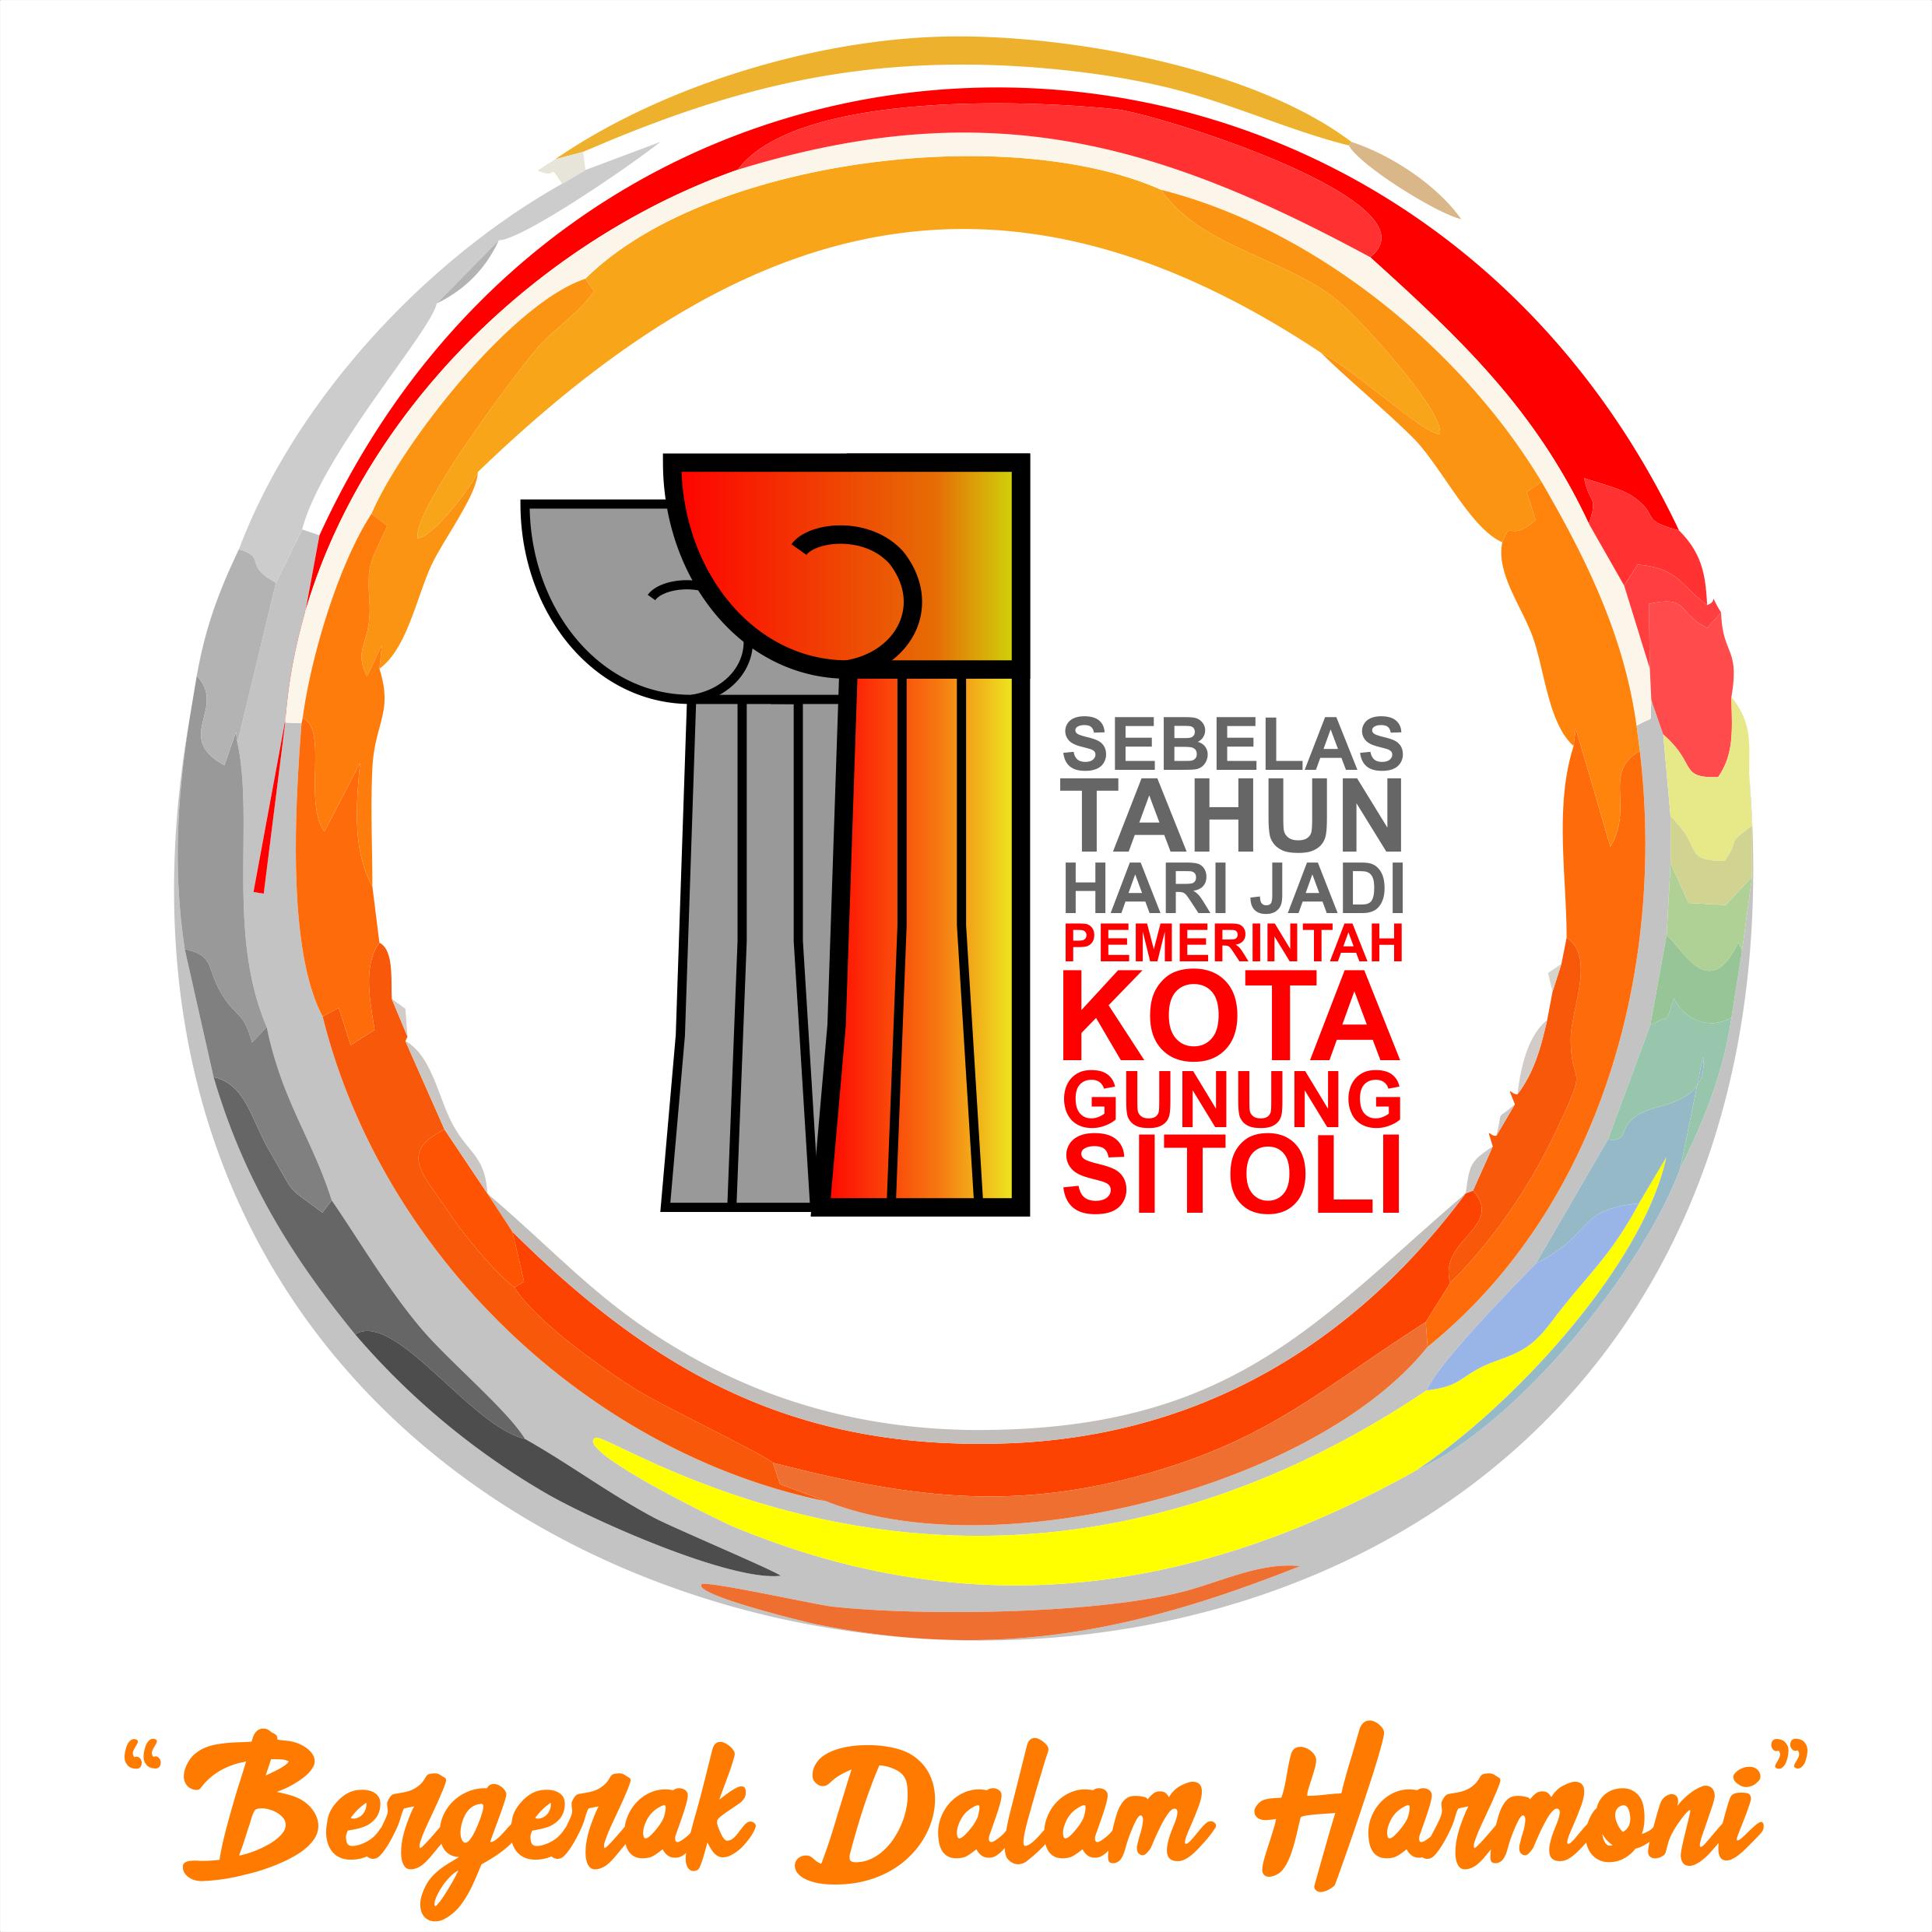 Surat Edaran Tentang Partisipasi Menyemarakkan Hari Jadi Kota Gunungsitoli Ke 11 Tahun 2019 Pemko Gunungsitoli